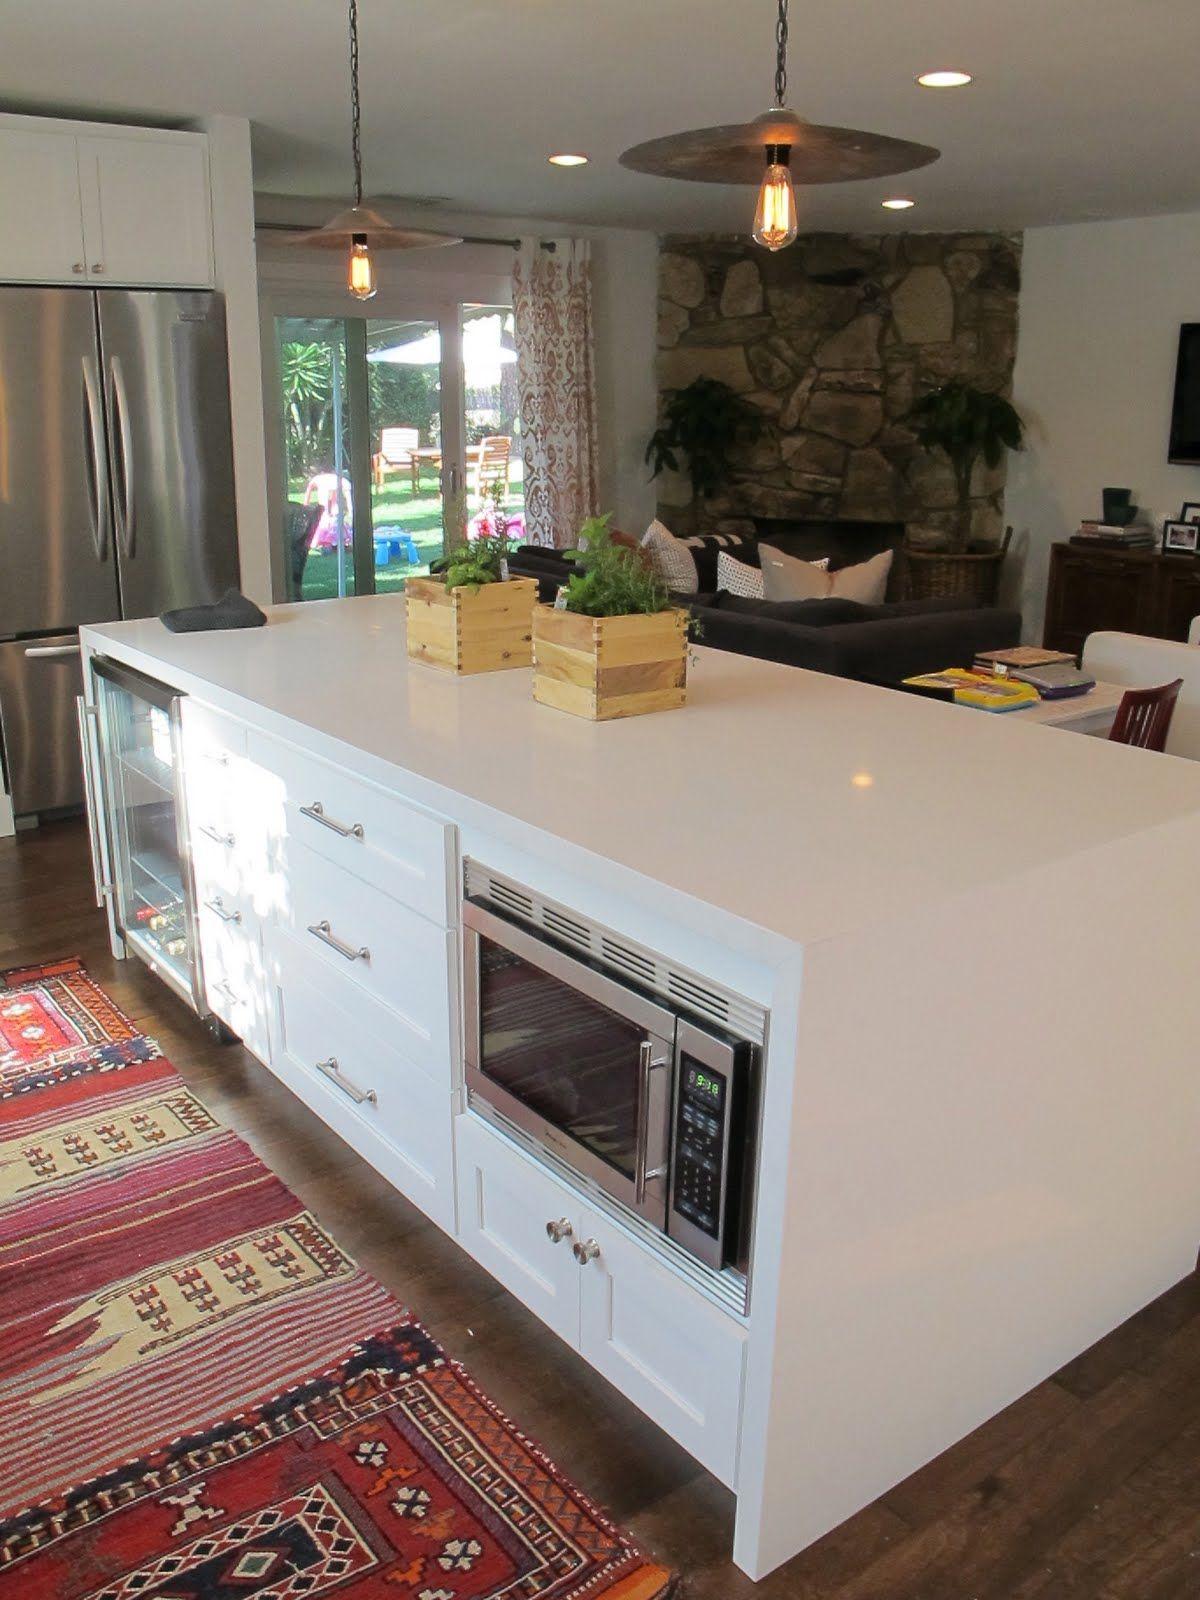 Sadie Stella Amber Interiors Design Amber Interiors Kitchen Inspirations